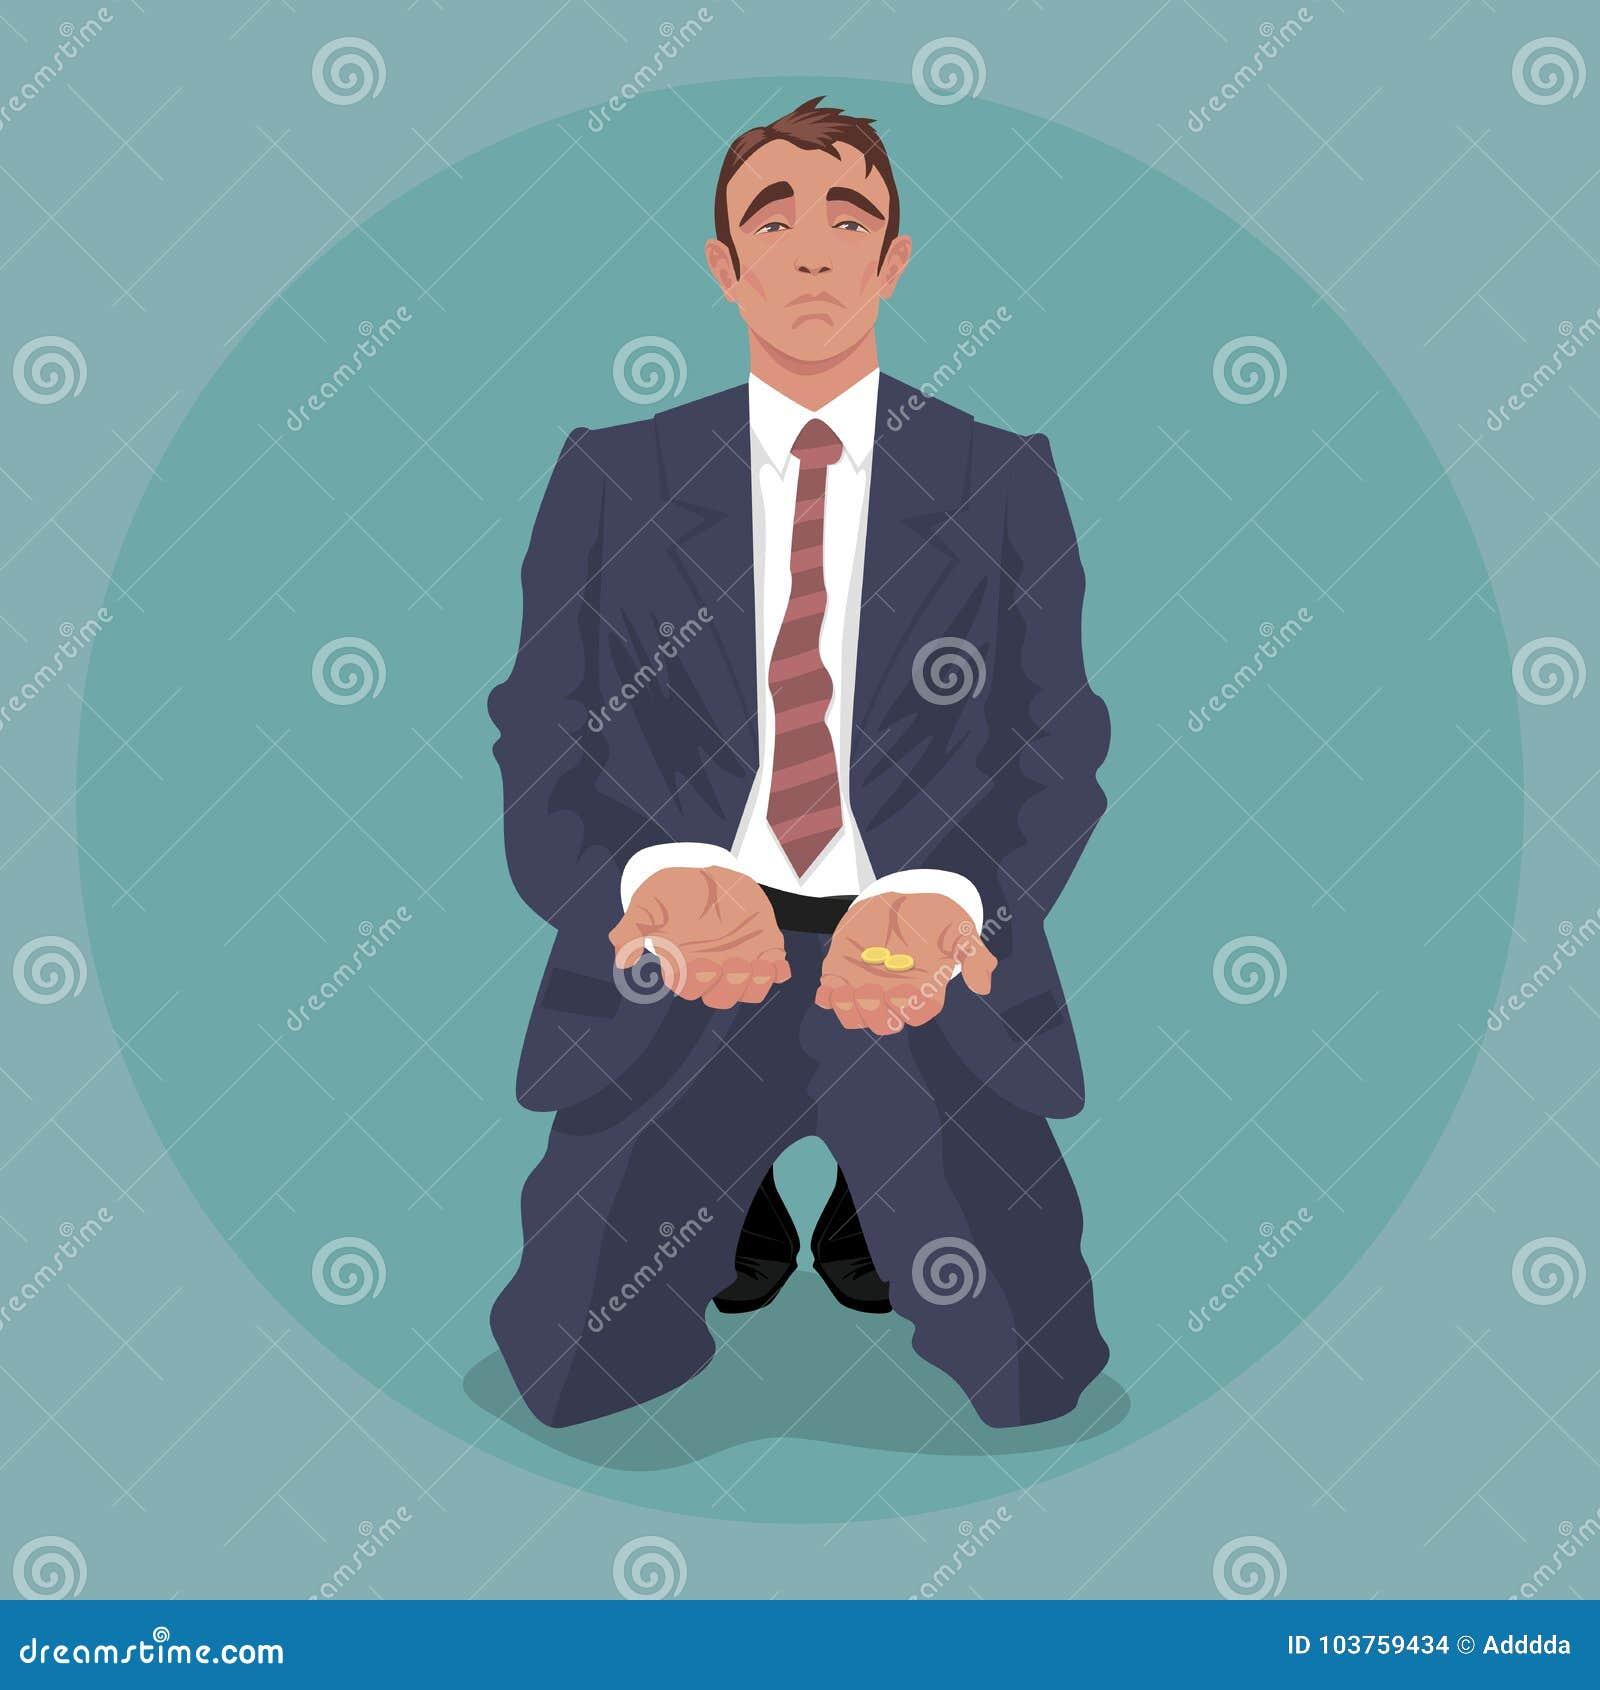 Tired businessman kneeling and begging